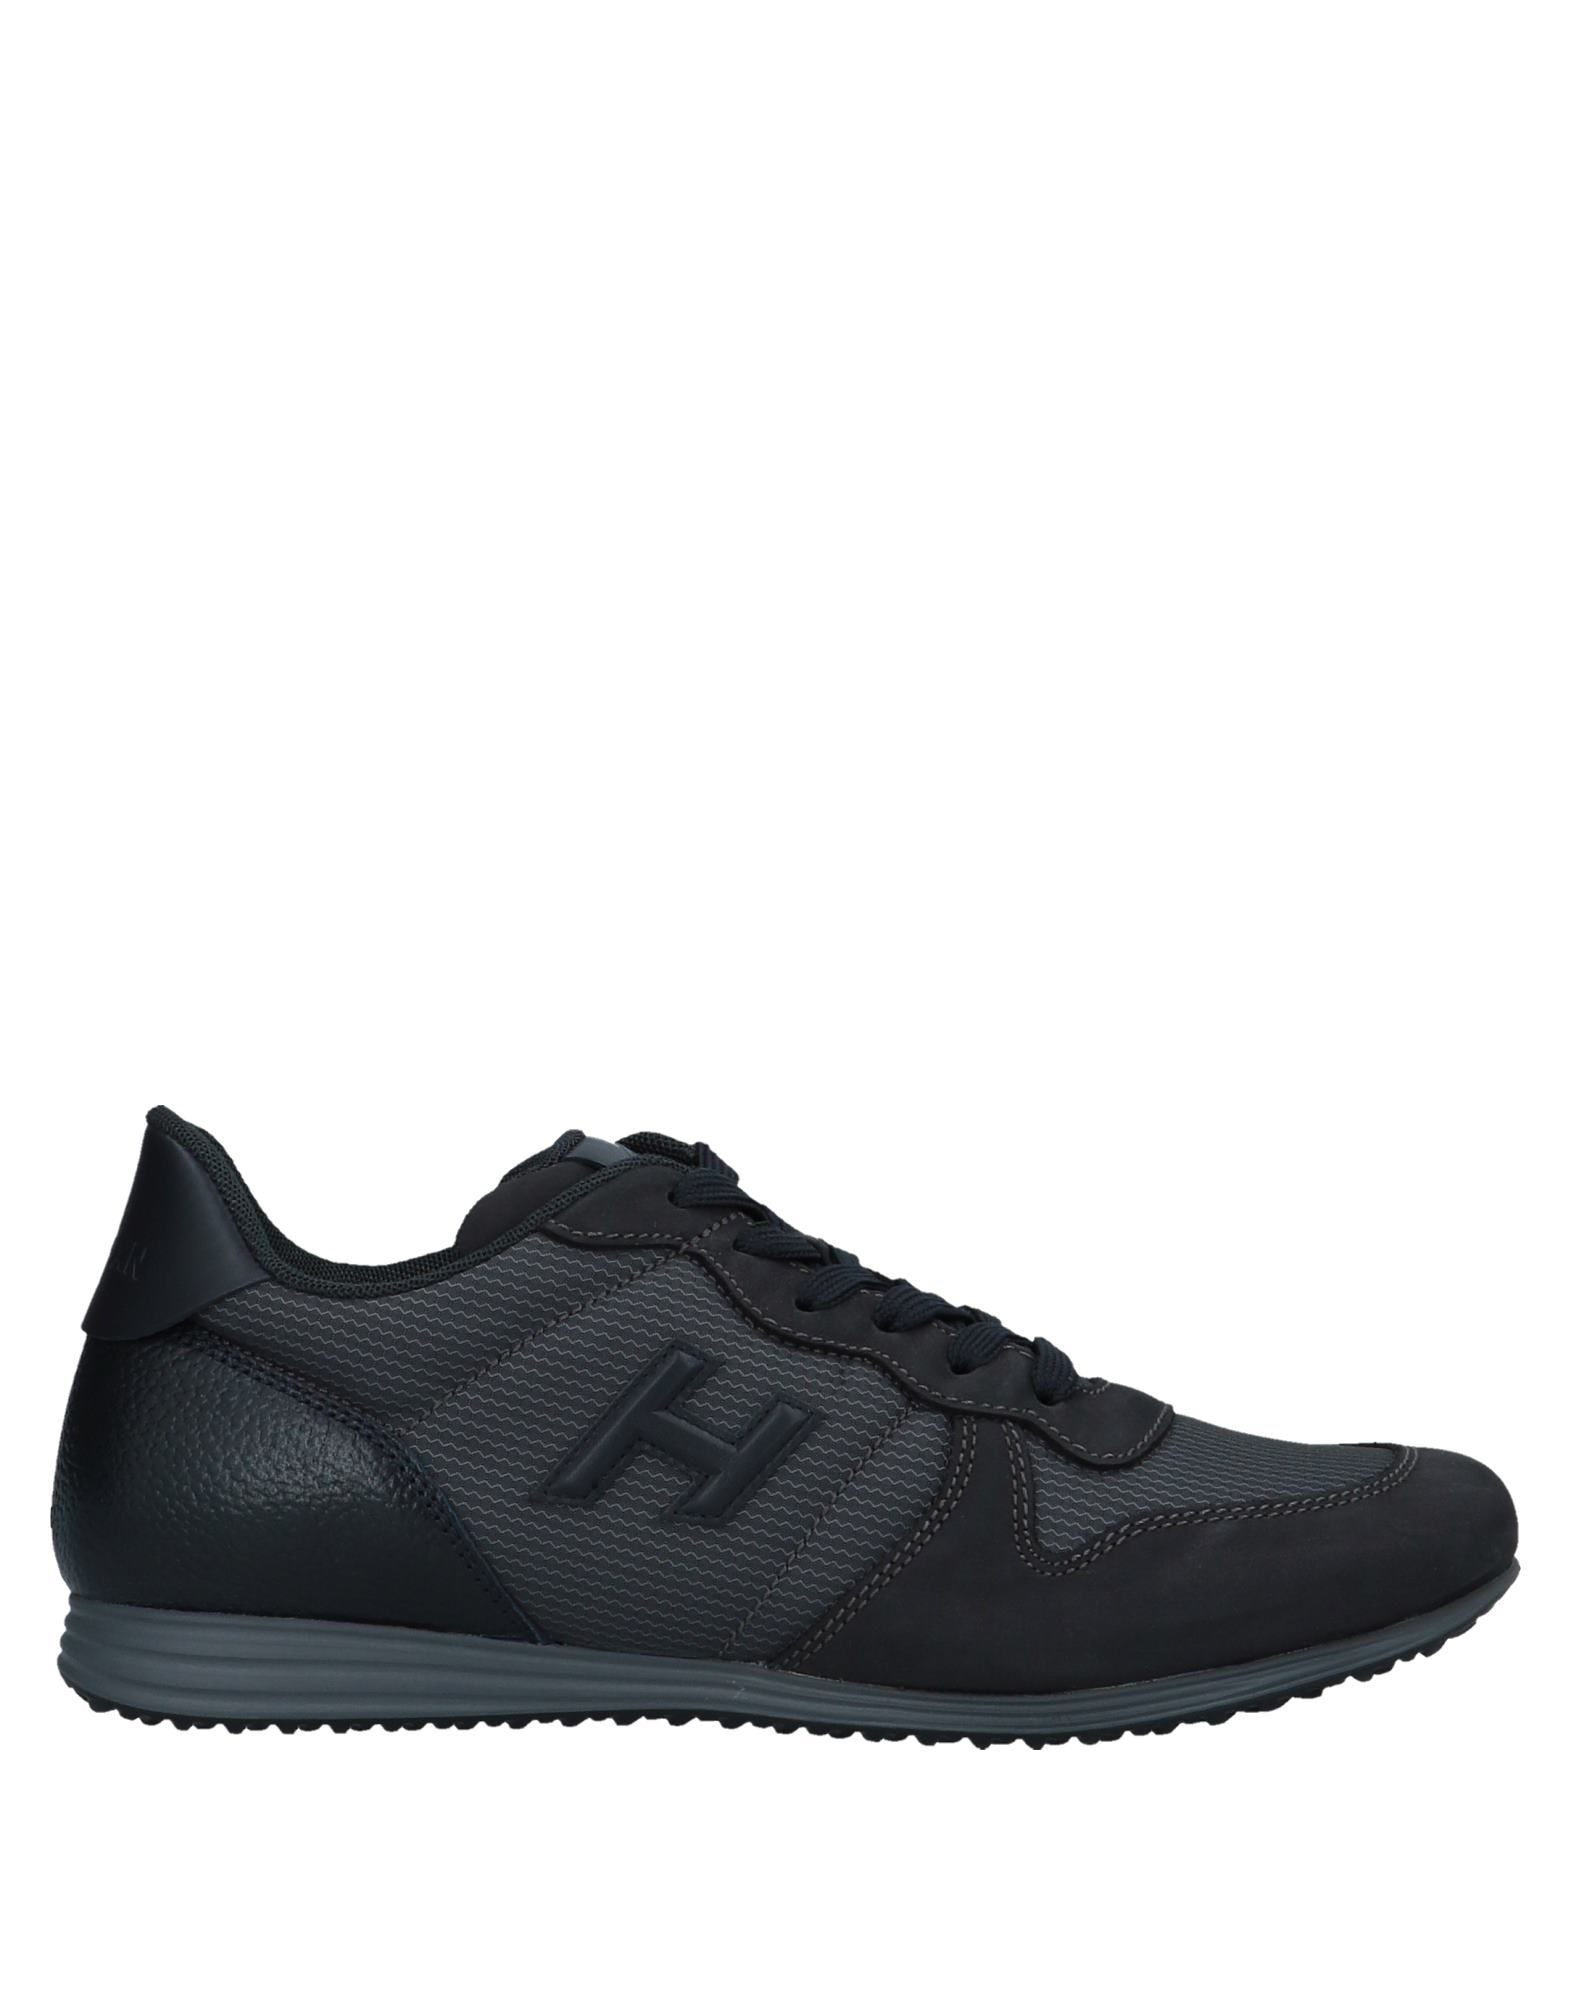 Hogan Sneakers Herren  11540570OM Gute Qualität beliebte Schuhe